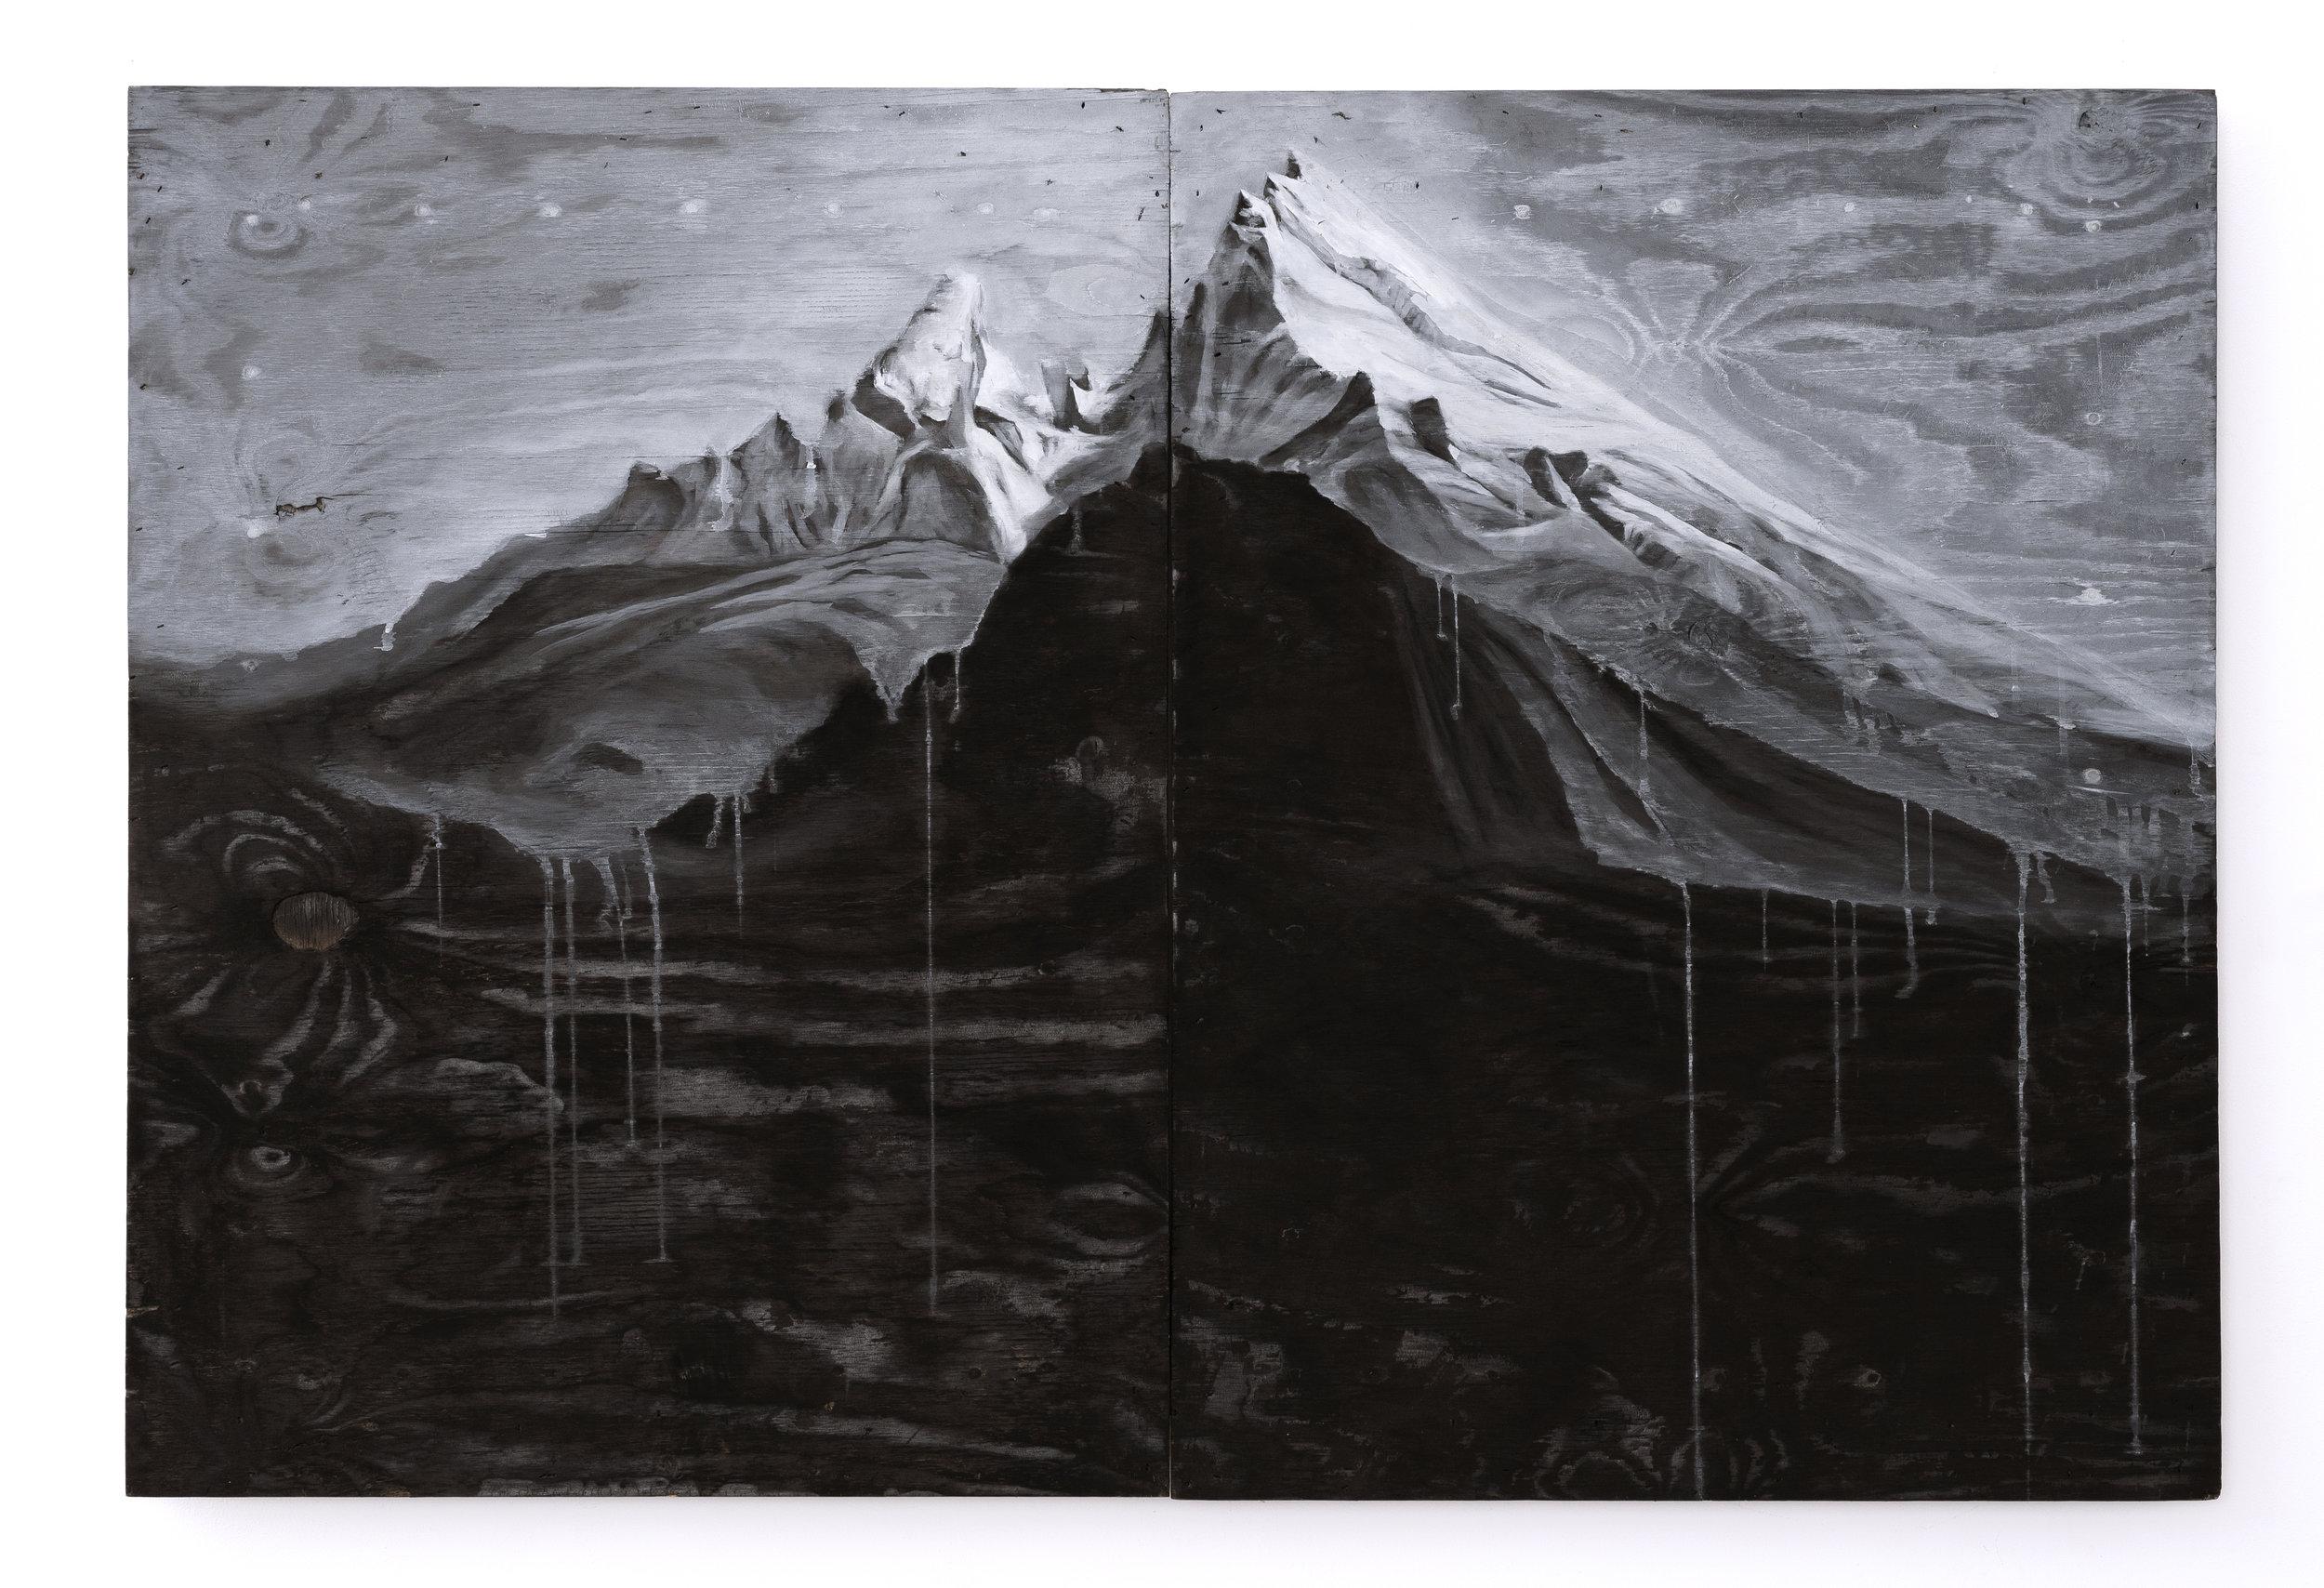 For Caspar David Friedrich - 60x48.jpg